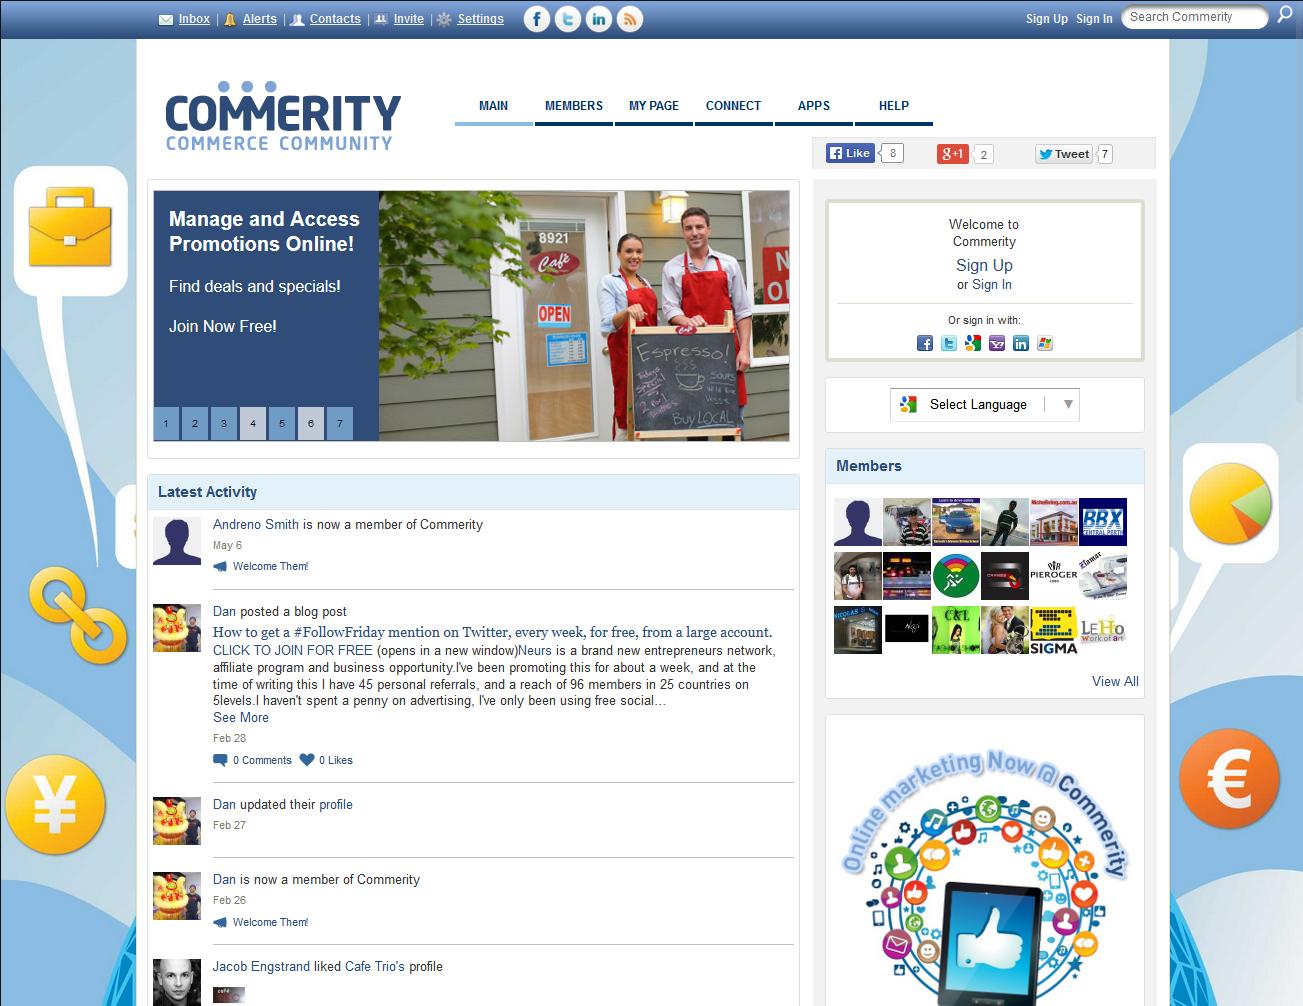 Commerity Commerce - Ning 2.0 Design